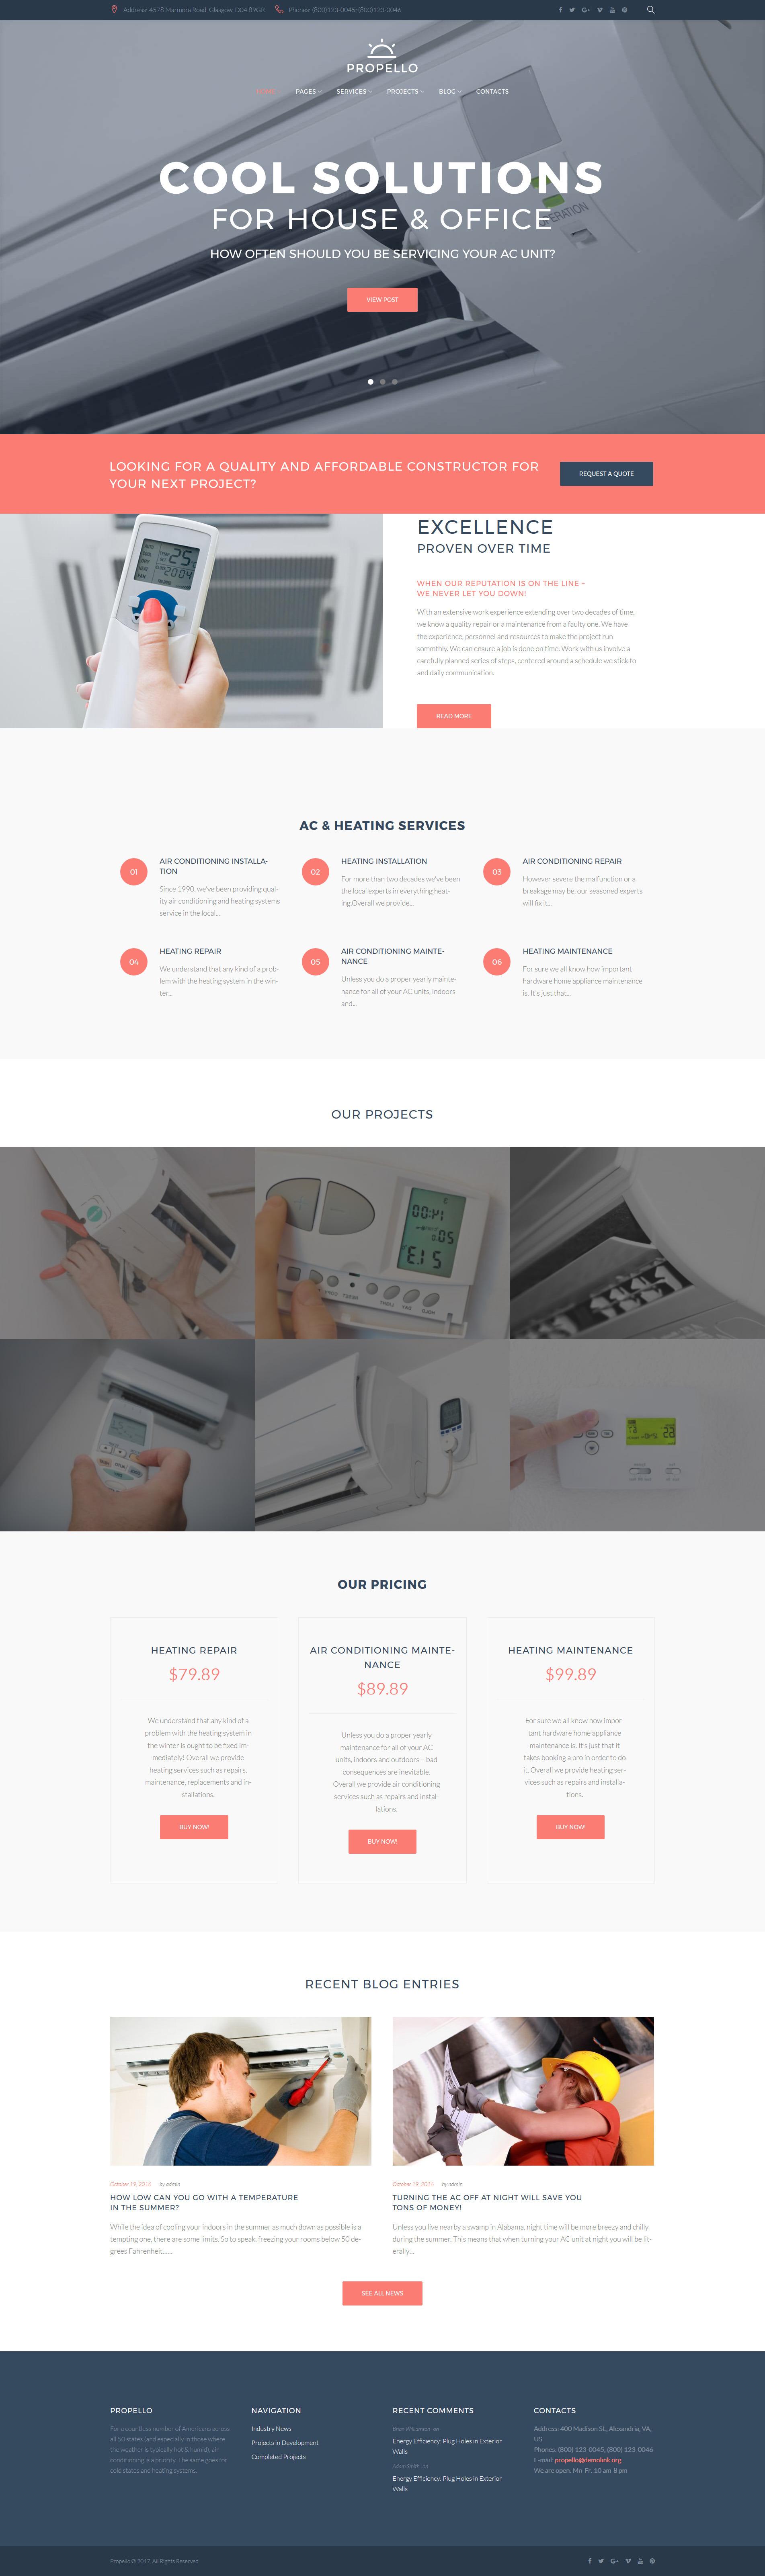 Propello - Air Conditioning Maintenance WordPress Theme New Screenshots BIG